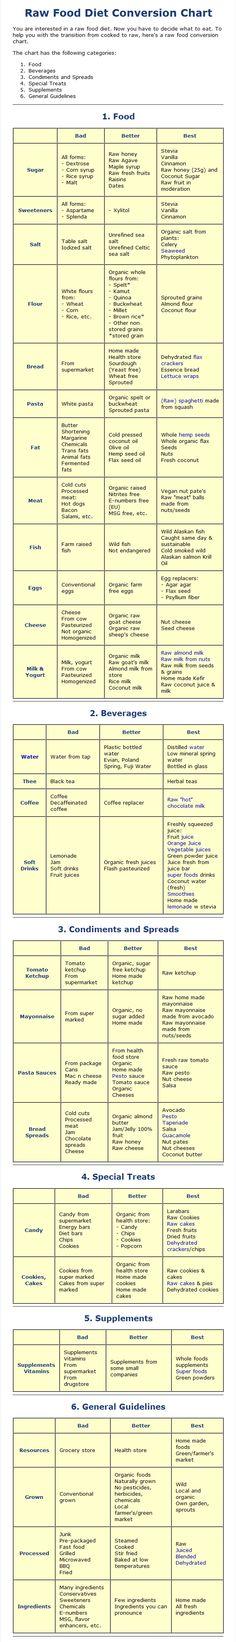 Raw food conversion chart